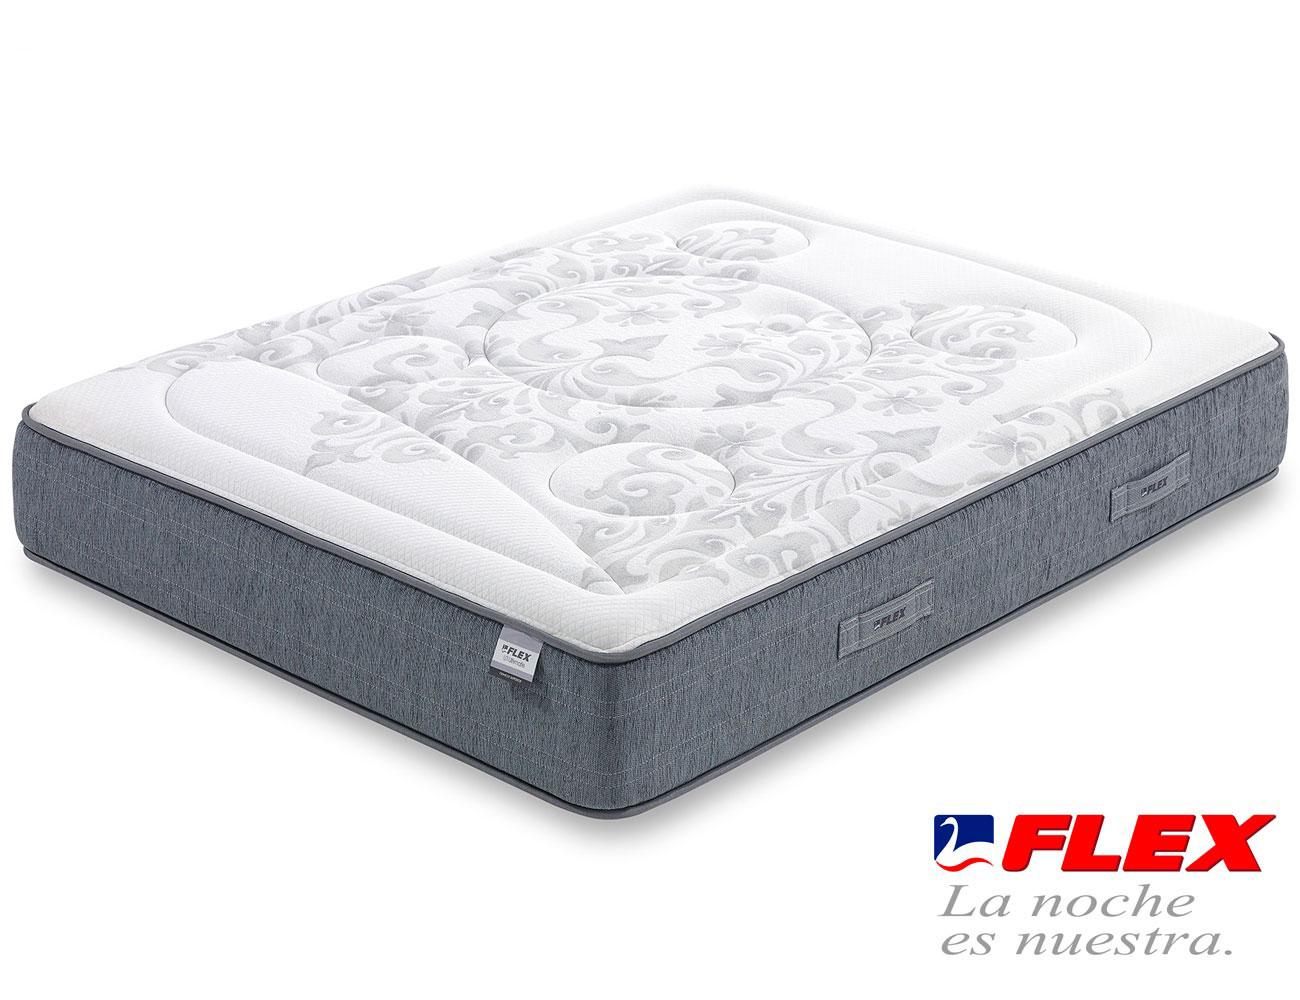 Colchon flex airvex viscoelastica gel garbi superior5